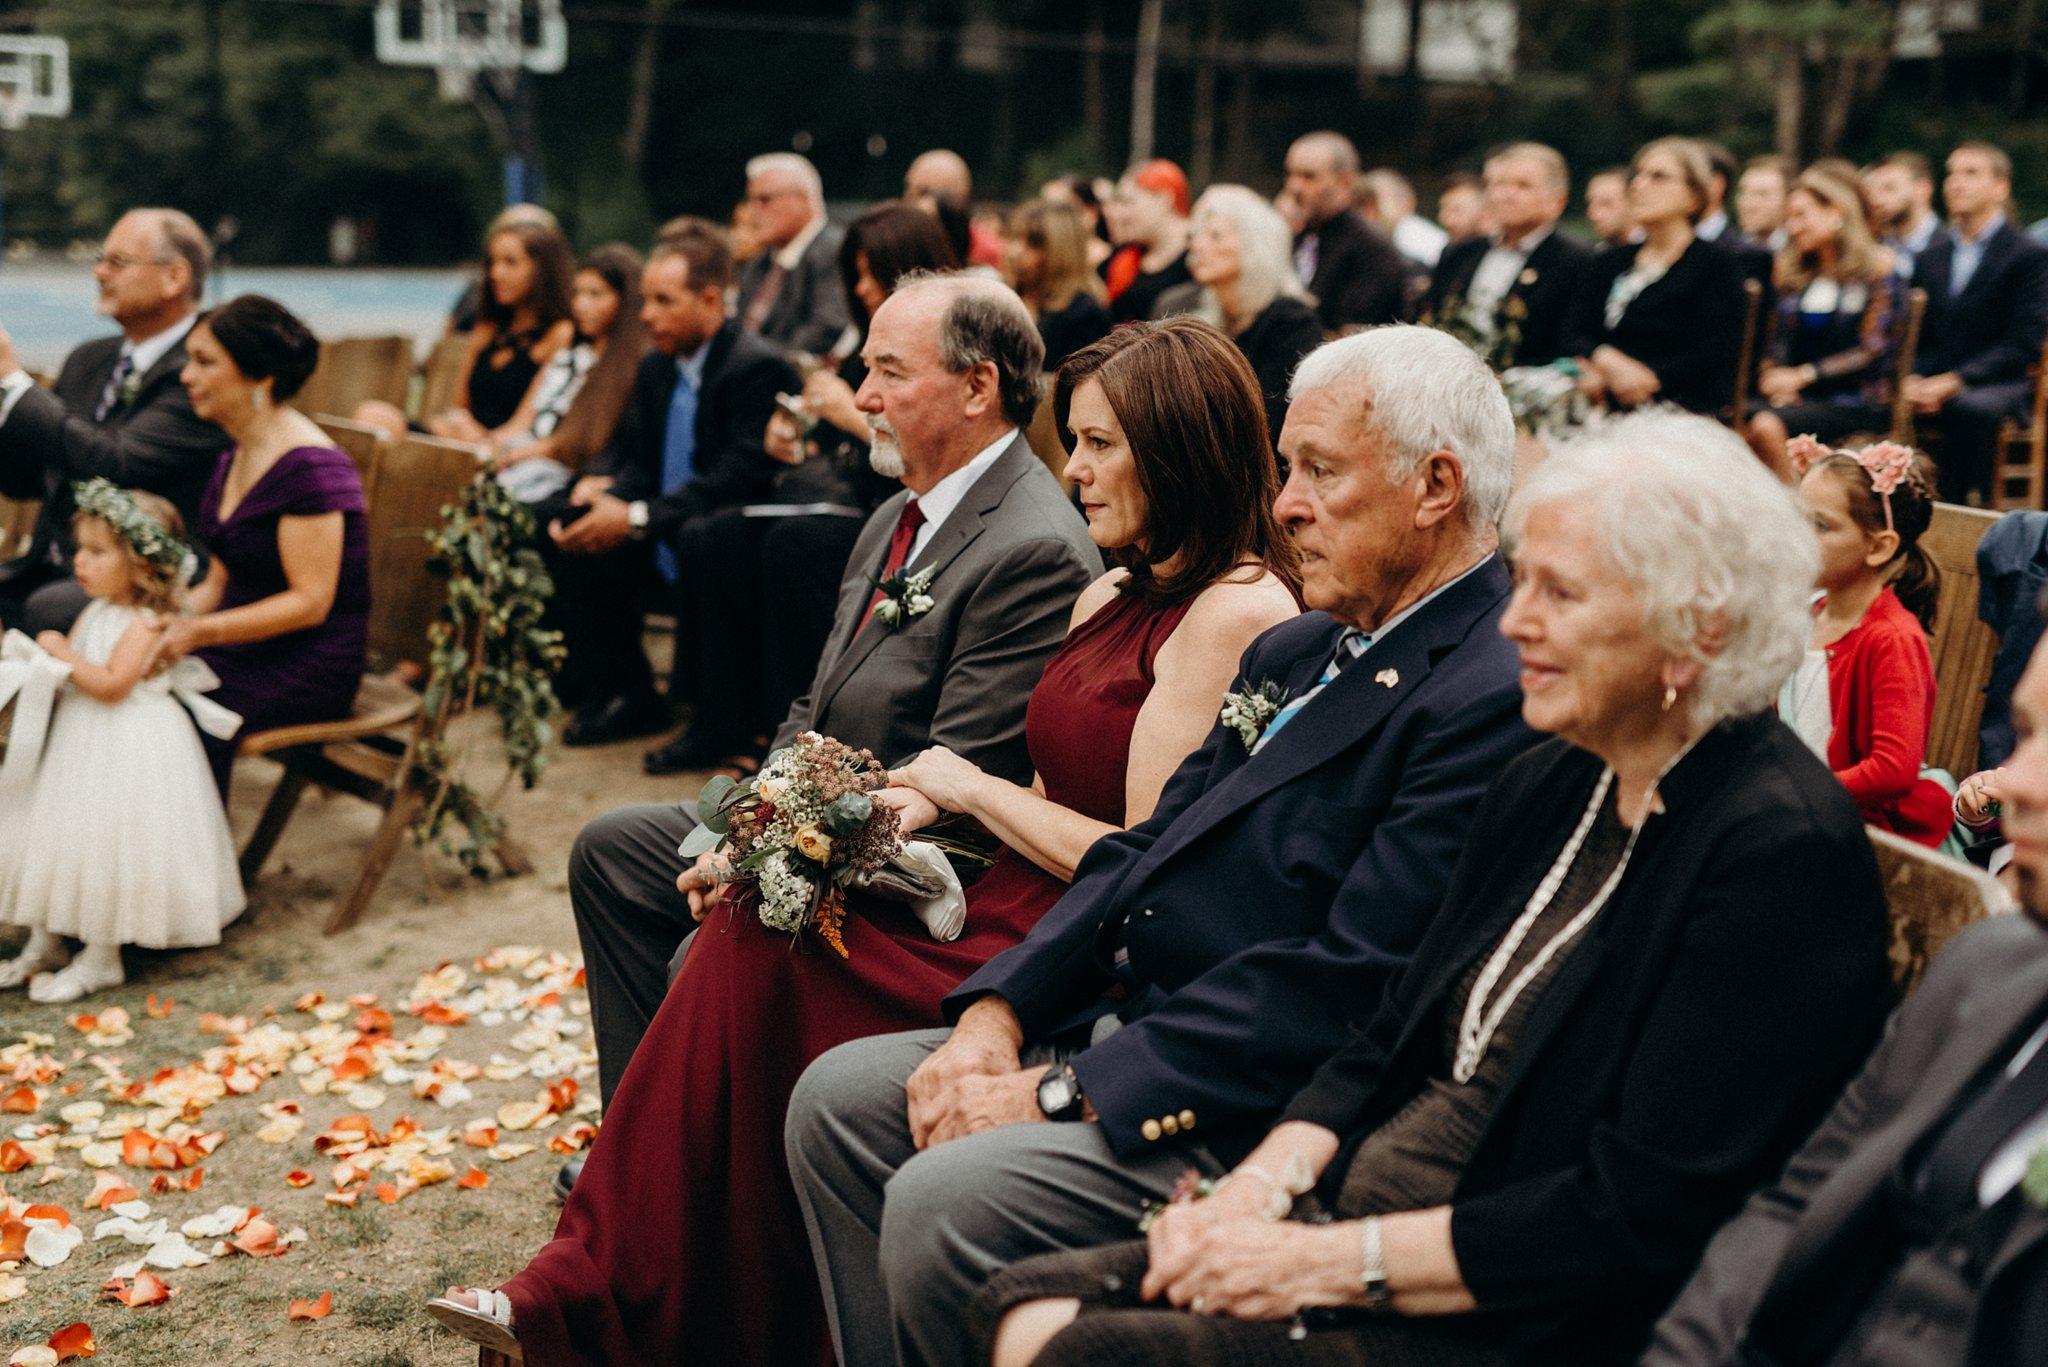 kaihla_tonai_intimate_wedding_elopement_photographer_6630.jpg